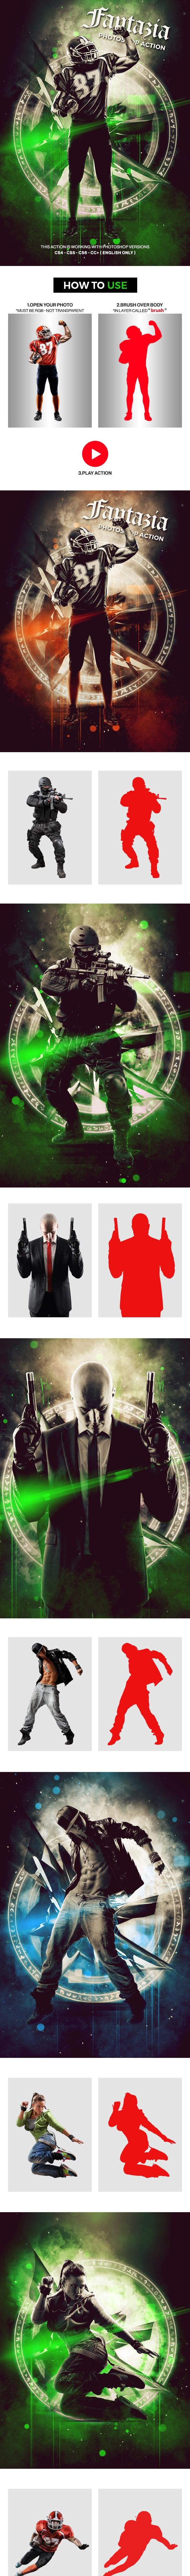 Fantazia Photoshop Action - Photo Effects Actions